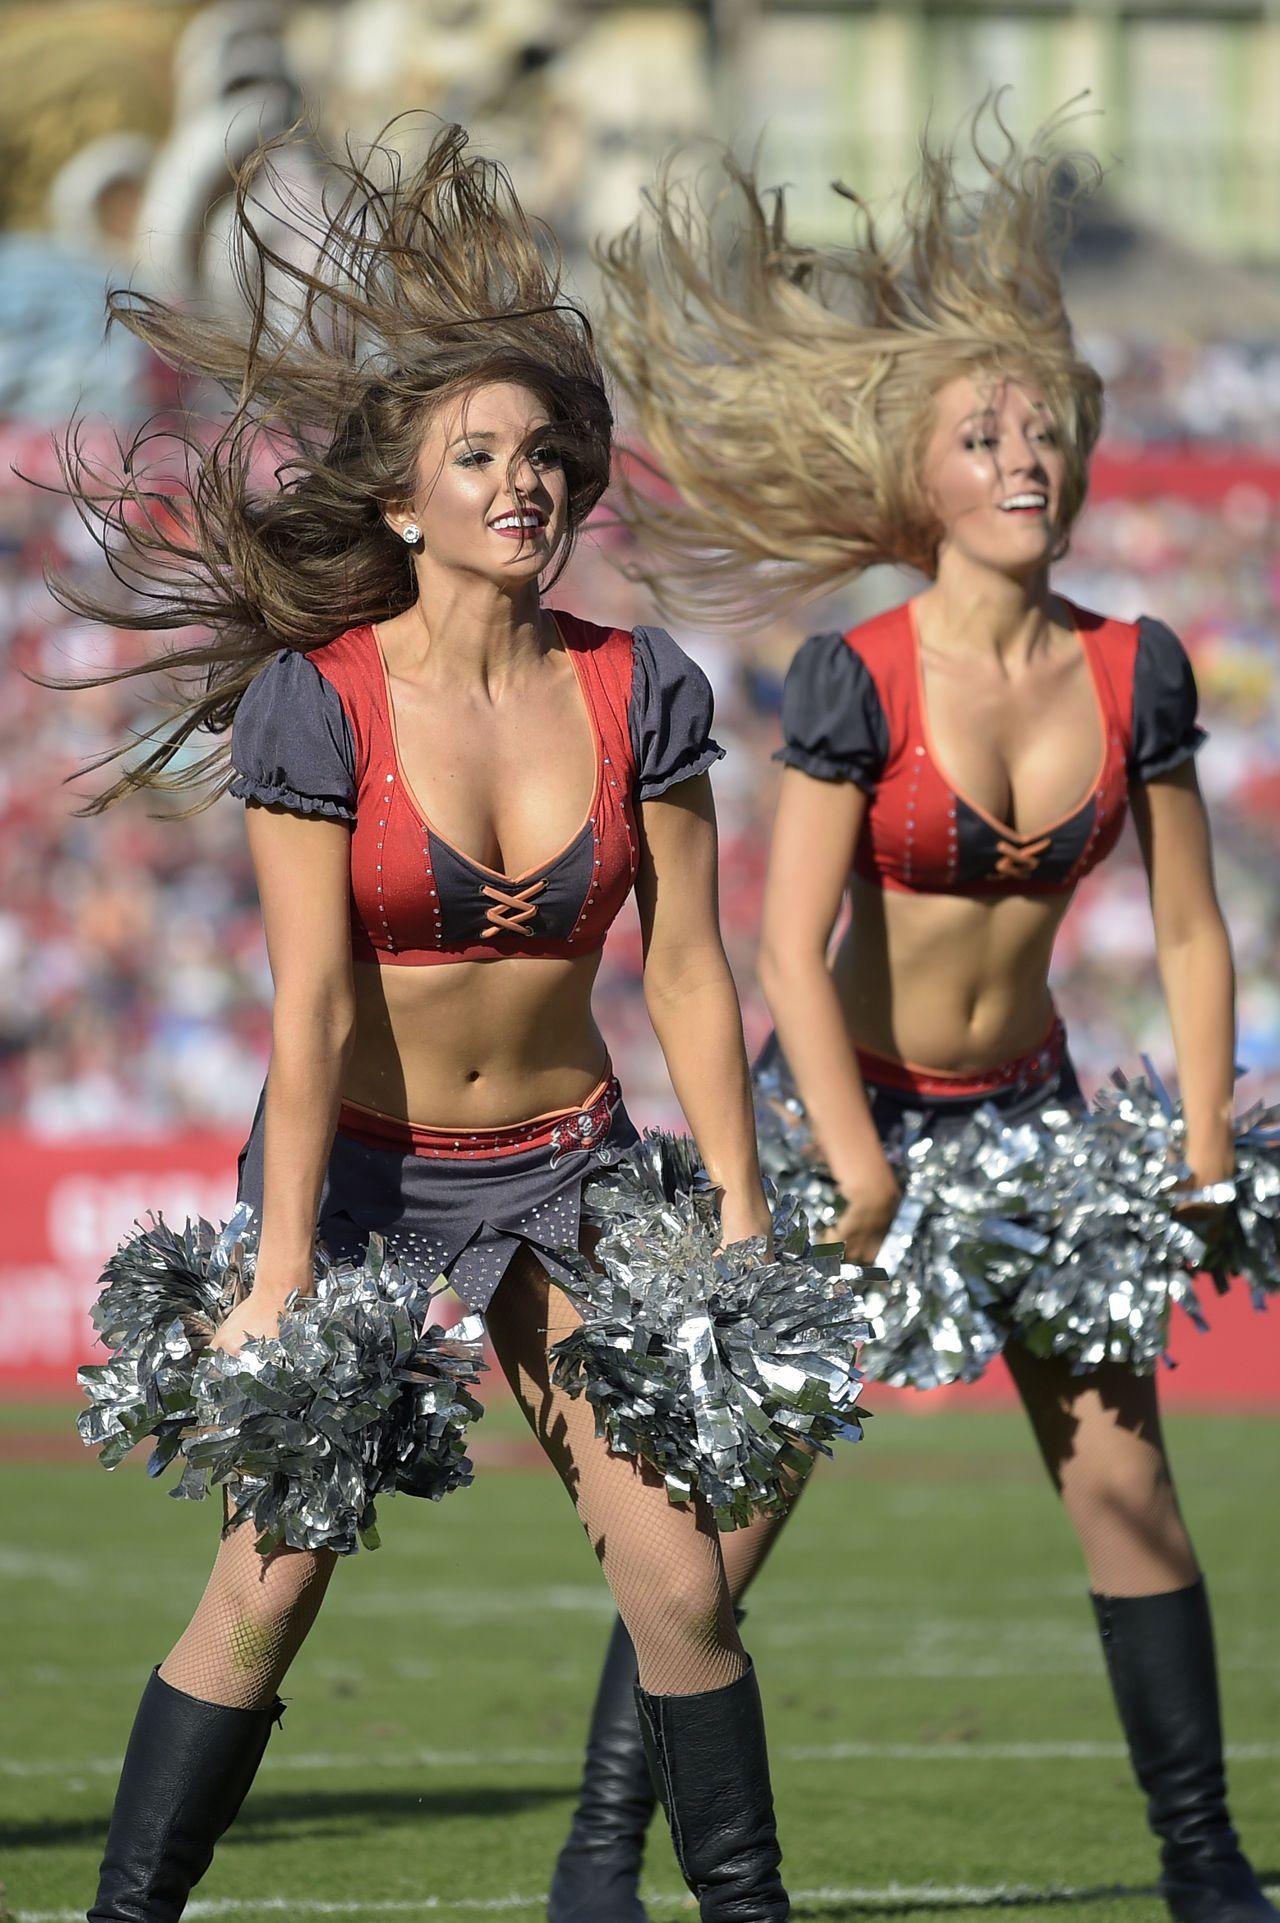 Bay buccaneers tricia tampa cheerleader